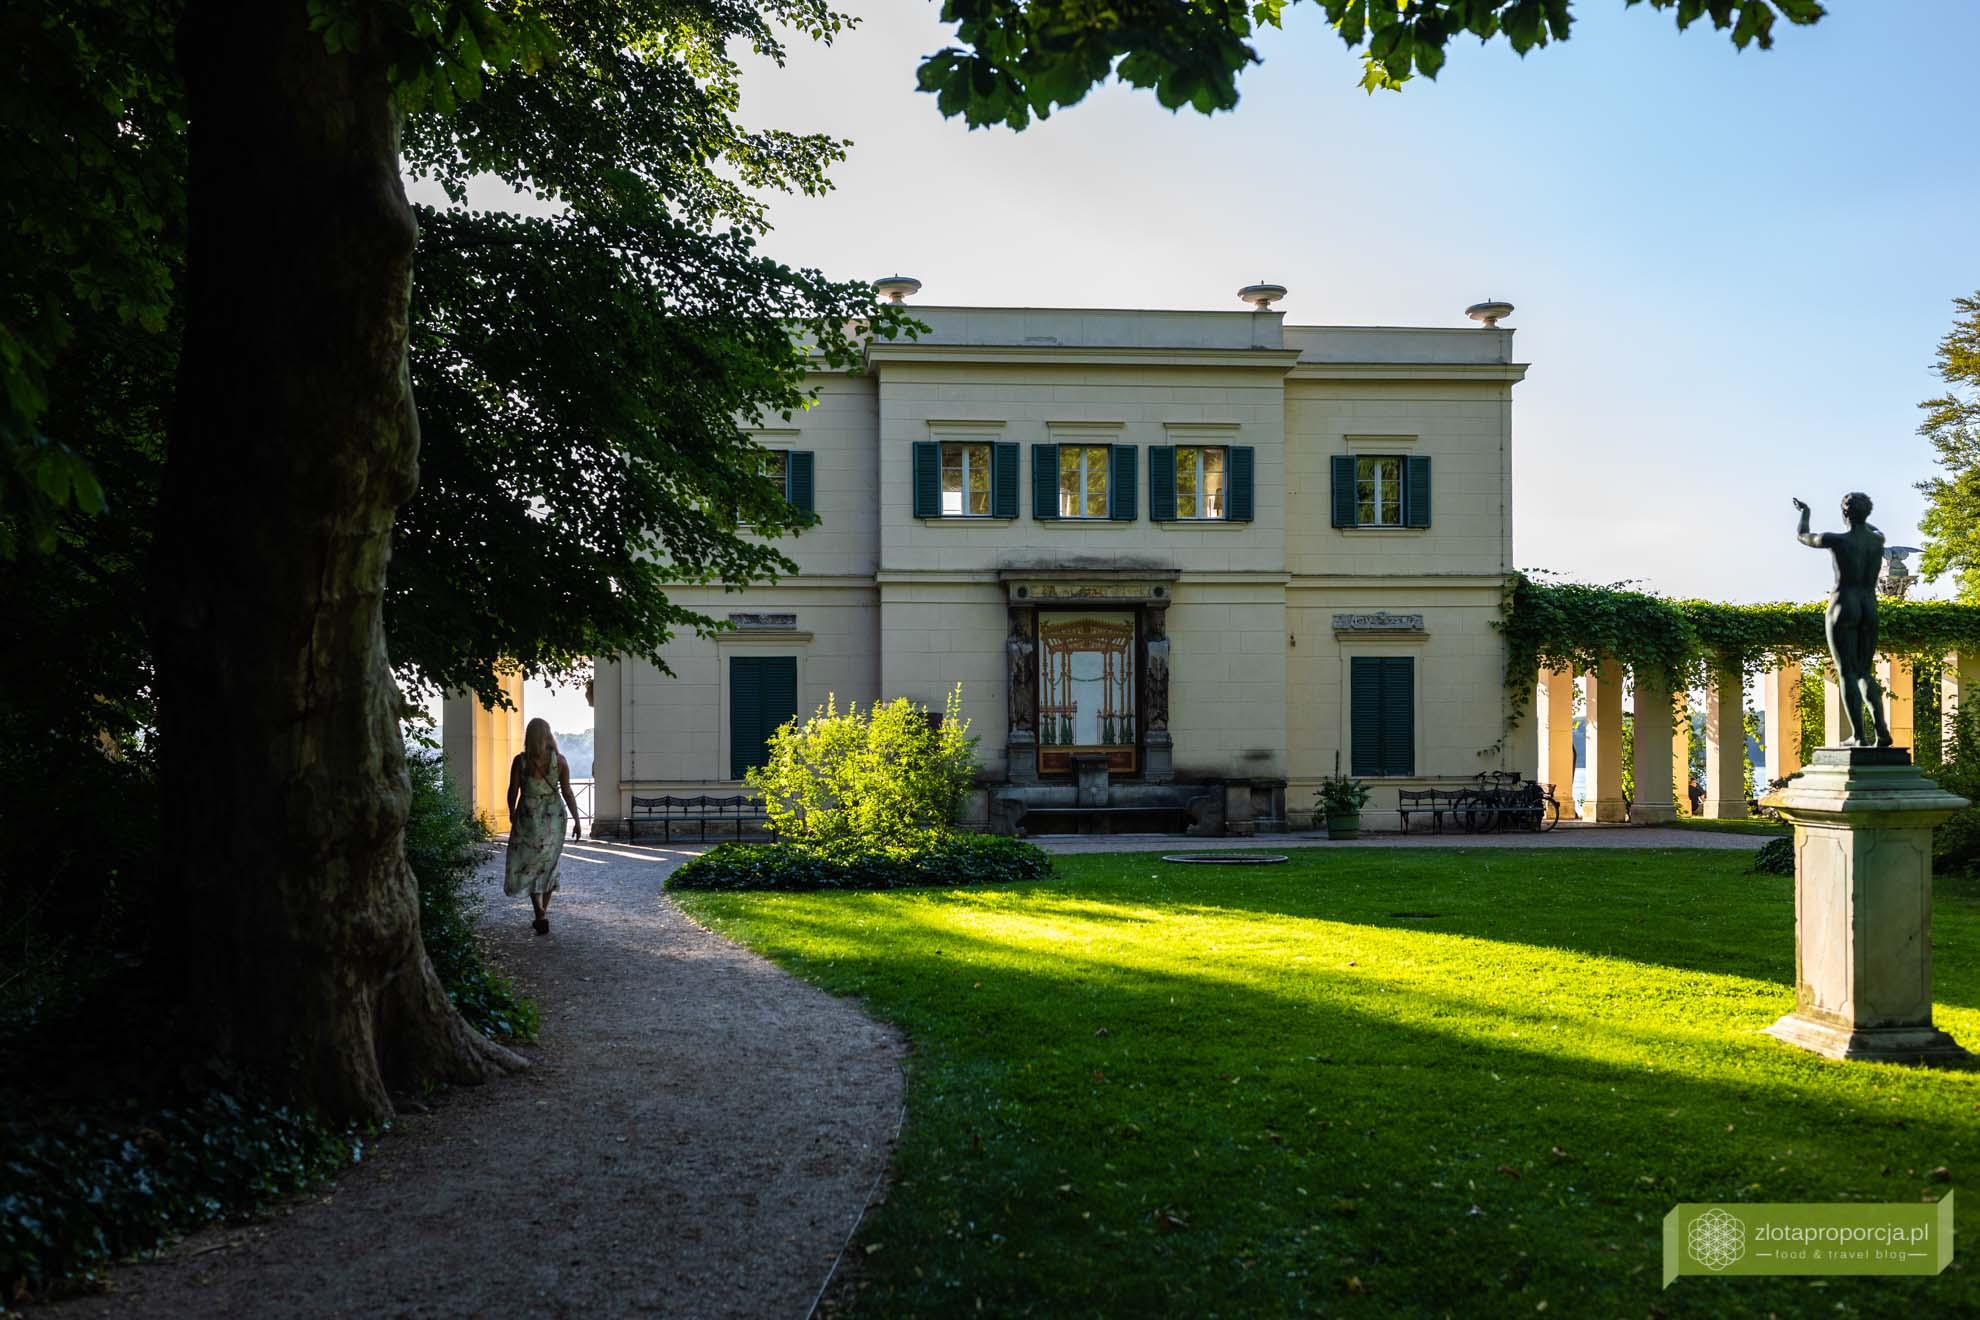 Berlin; Steglitz-Zehlendorf; atrakcje Berlina; Unesco; Berlin Unesco; Park Glienicke; Glienicke; Kasyno Glienicke;